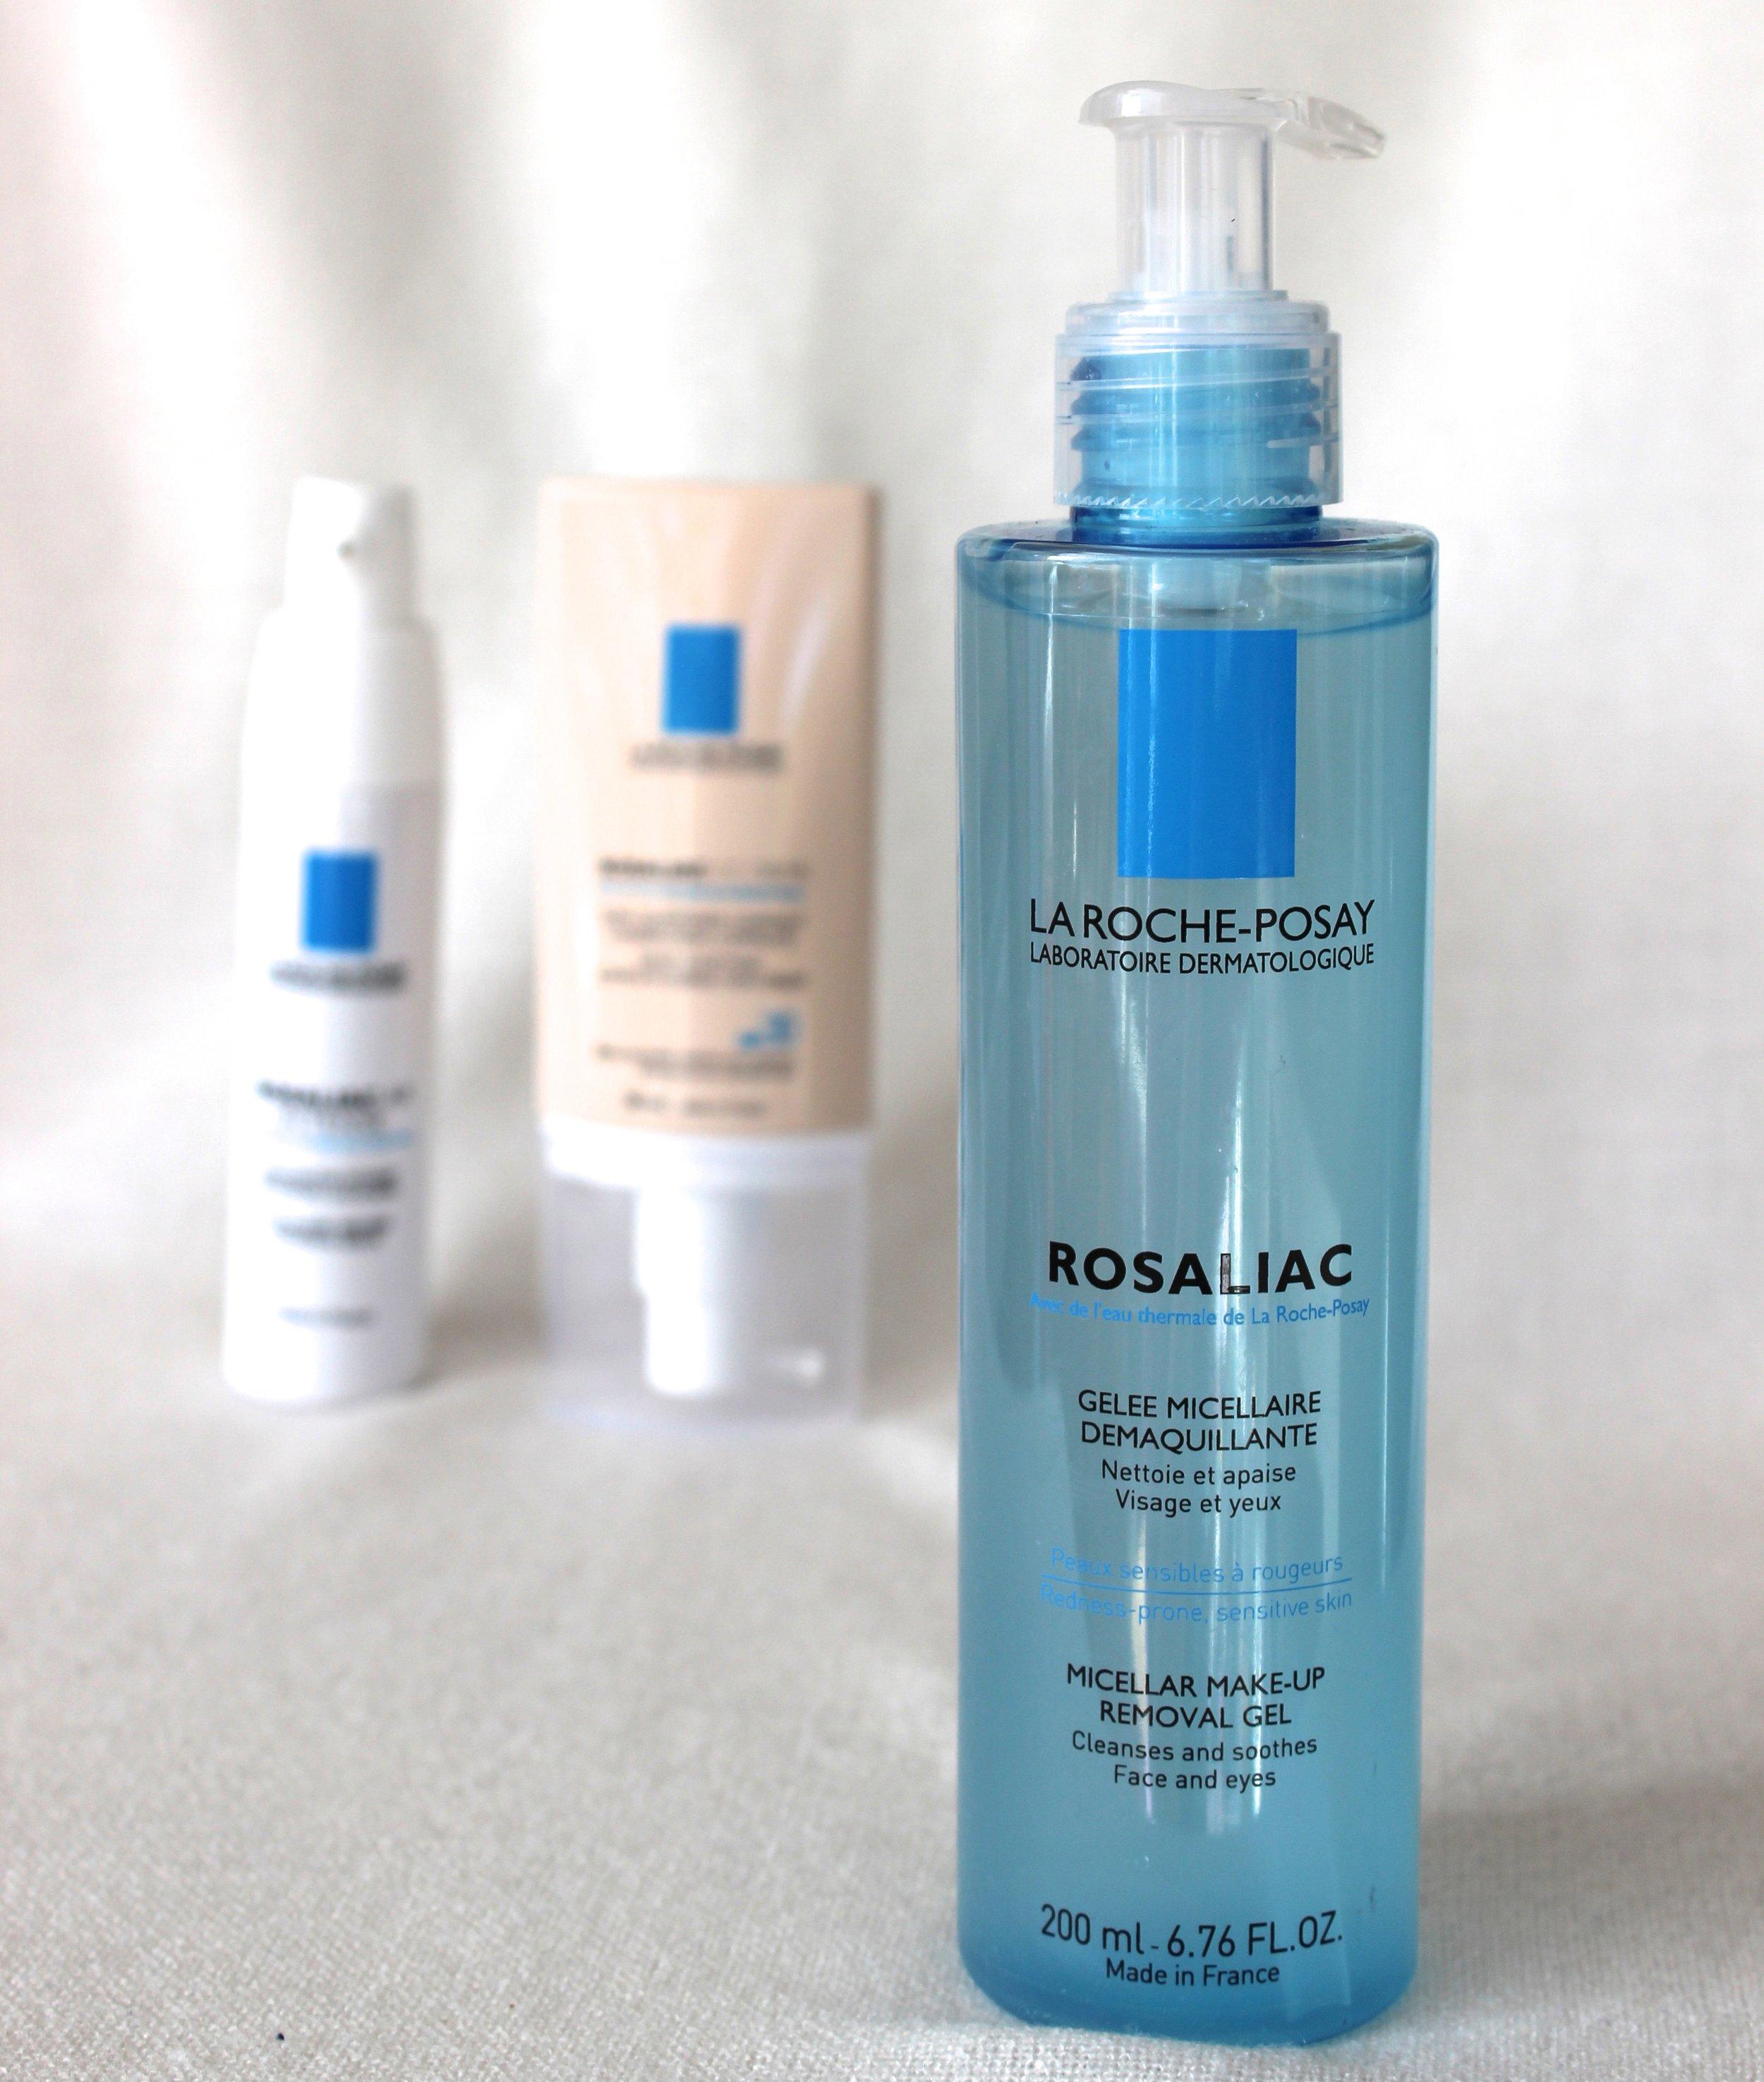 La Roche-Posay Rosaliac